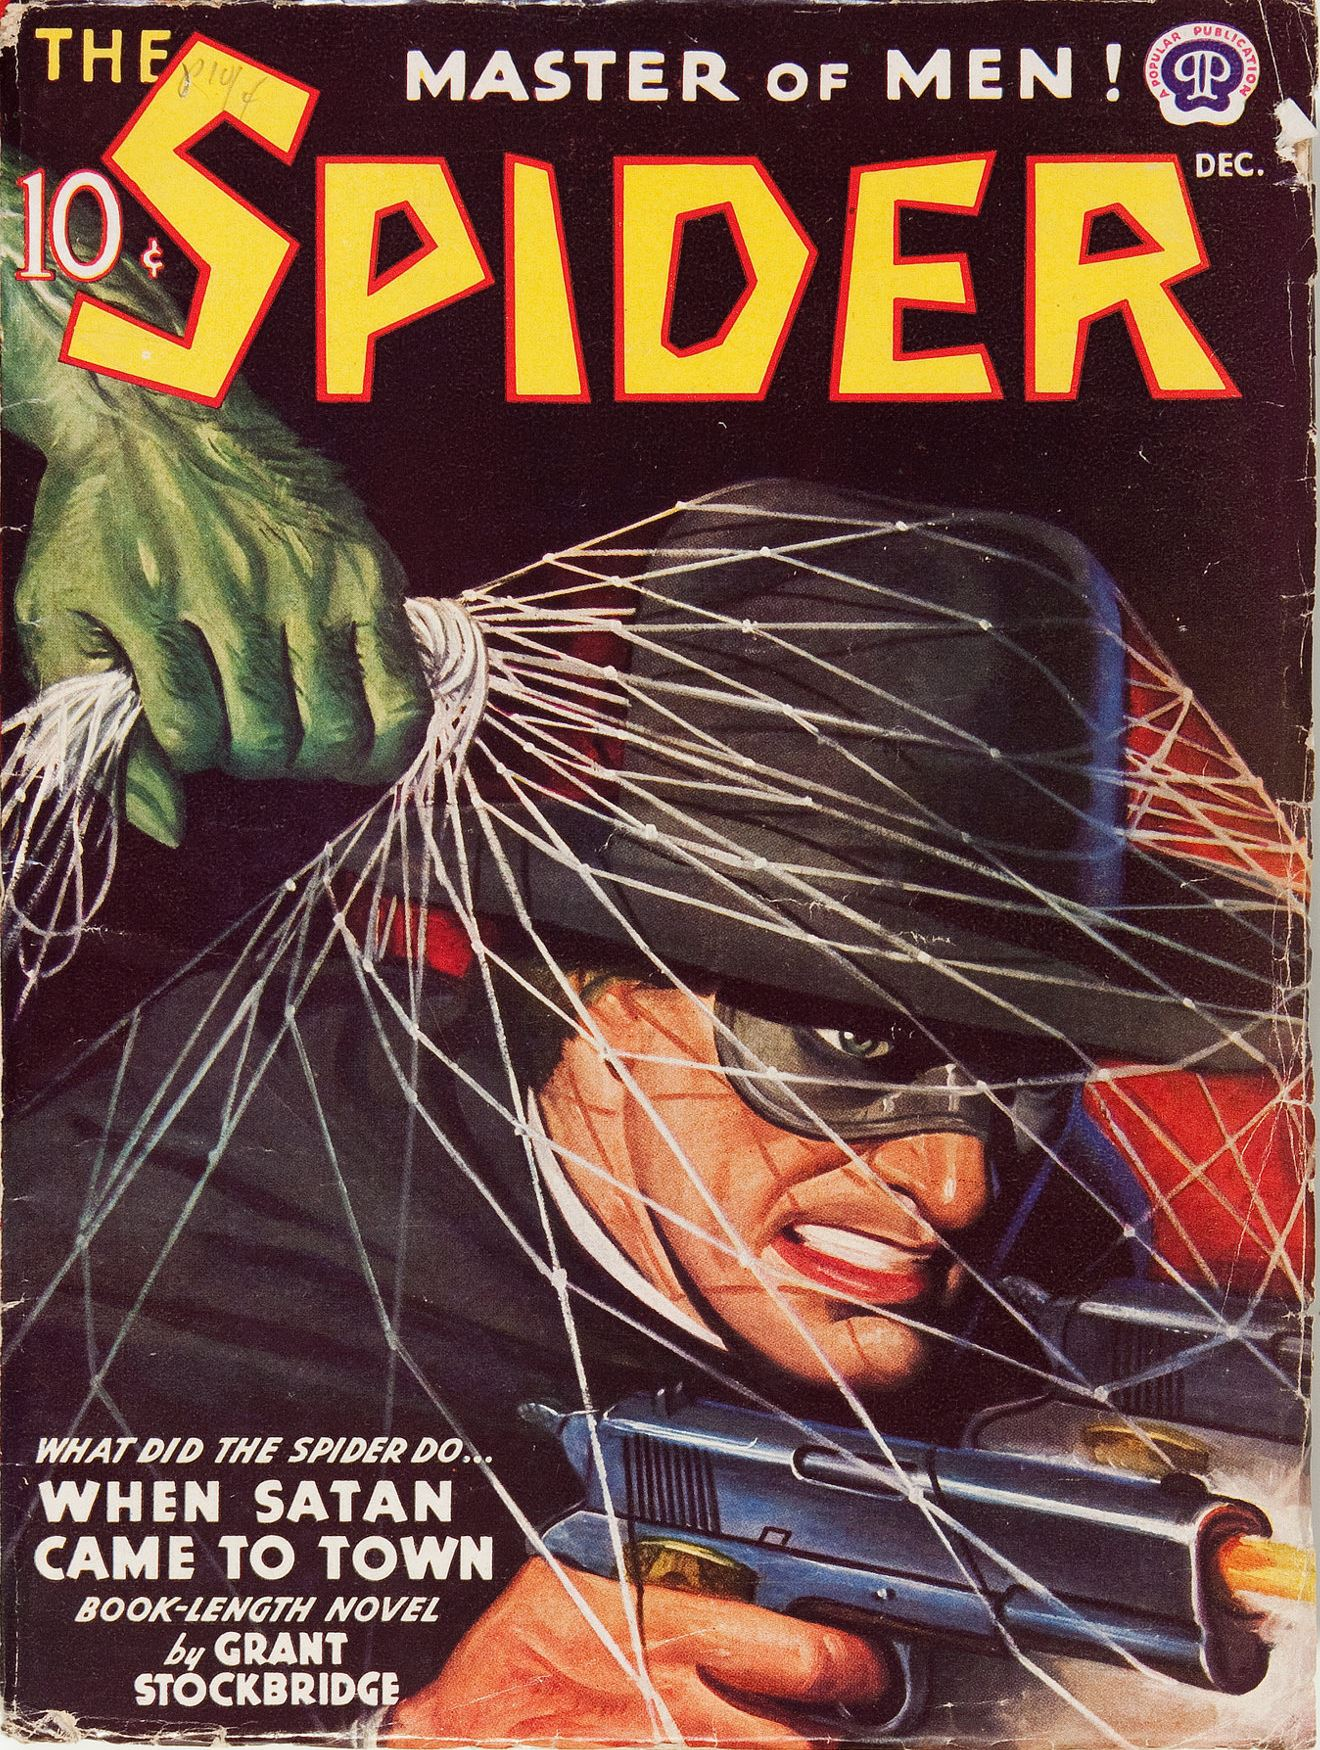 The Spider December 1943